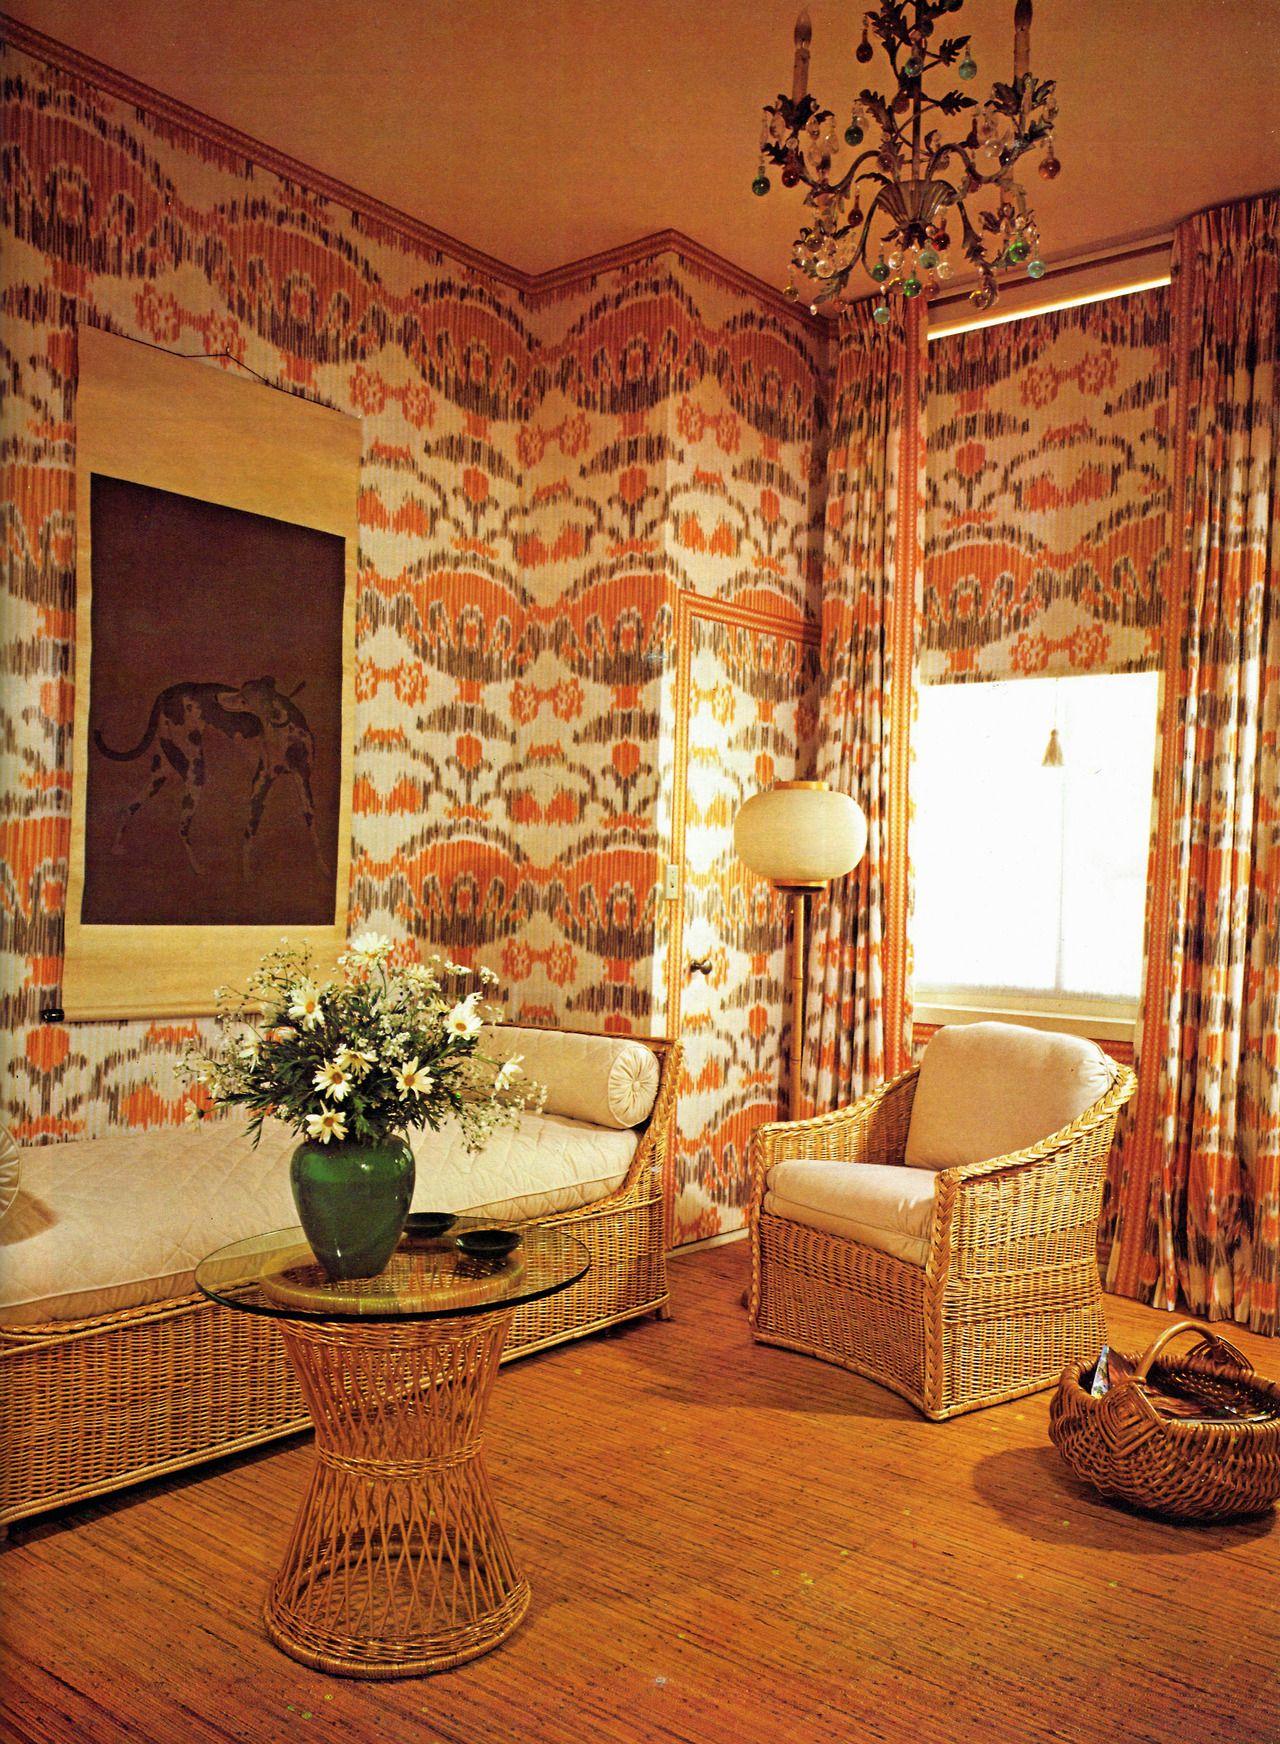 Living Room Design 1980 Retro Style Living Room Small Apartment Design Luxury House Designs #retro #style #living #room